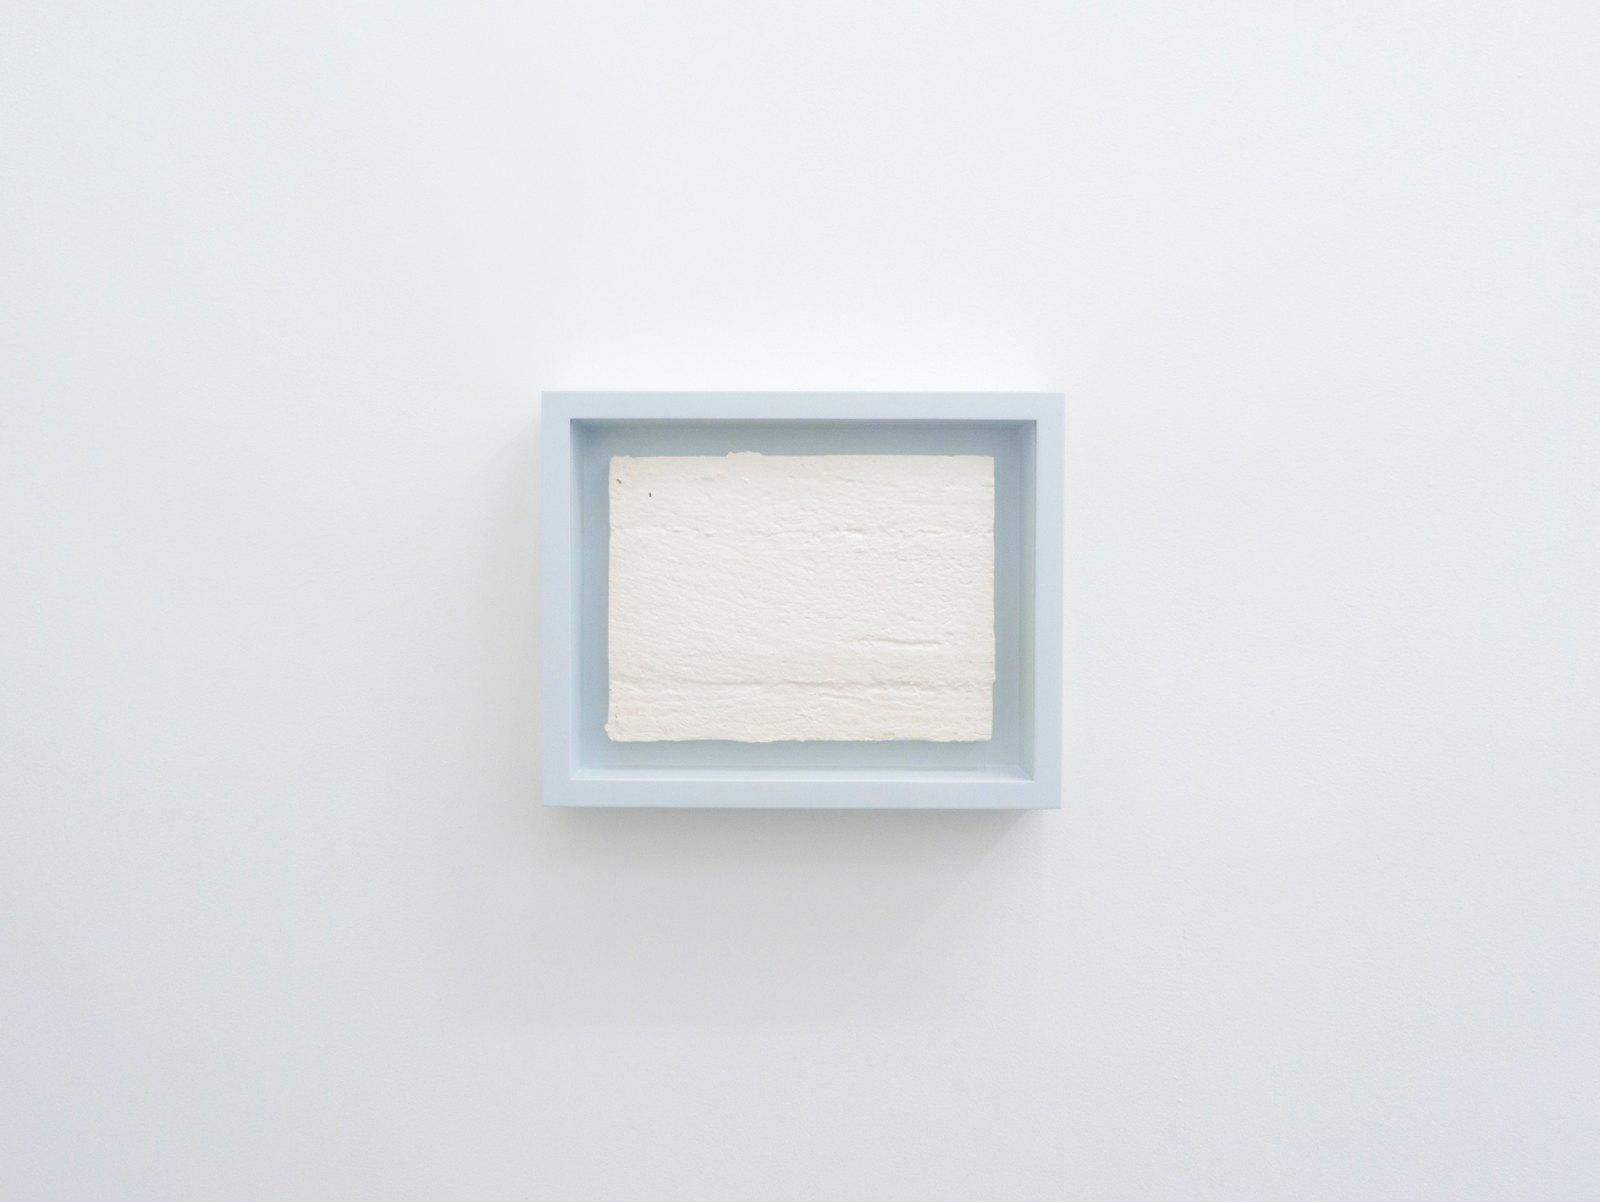 Relief; foyer wall, 2011, plaster, frame, 32,4 x 40,4 x 7,6 cm